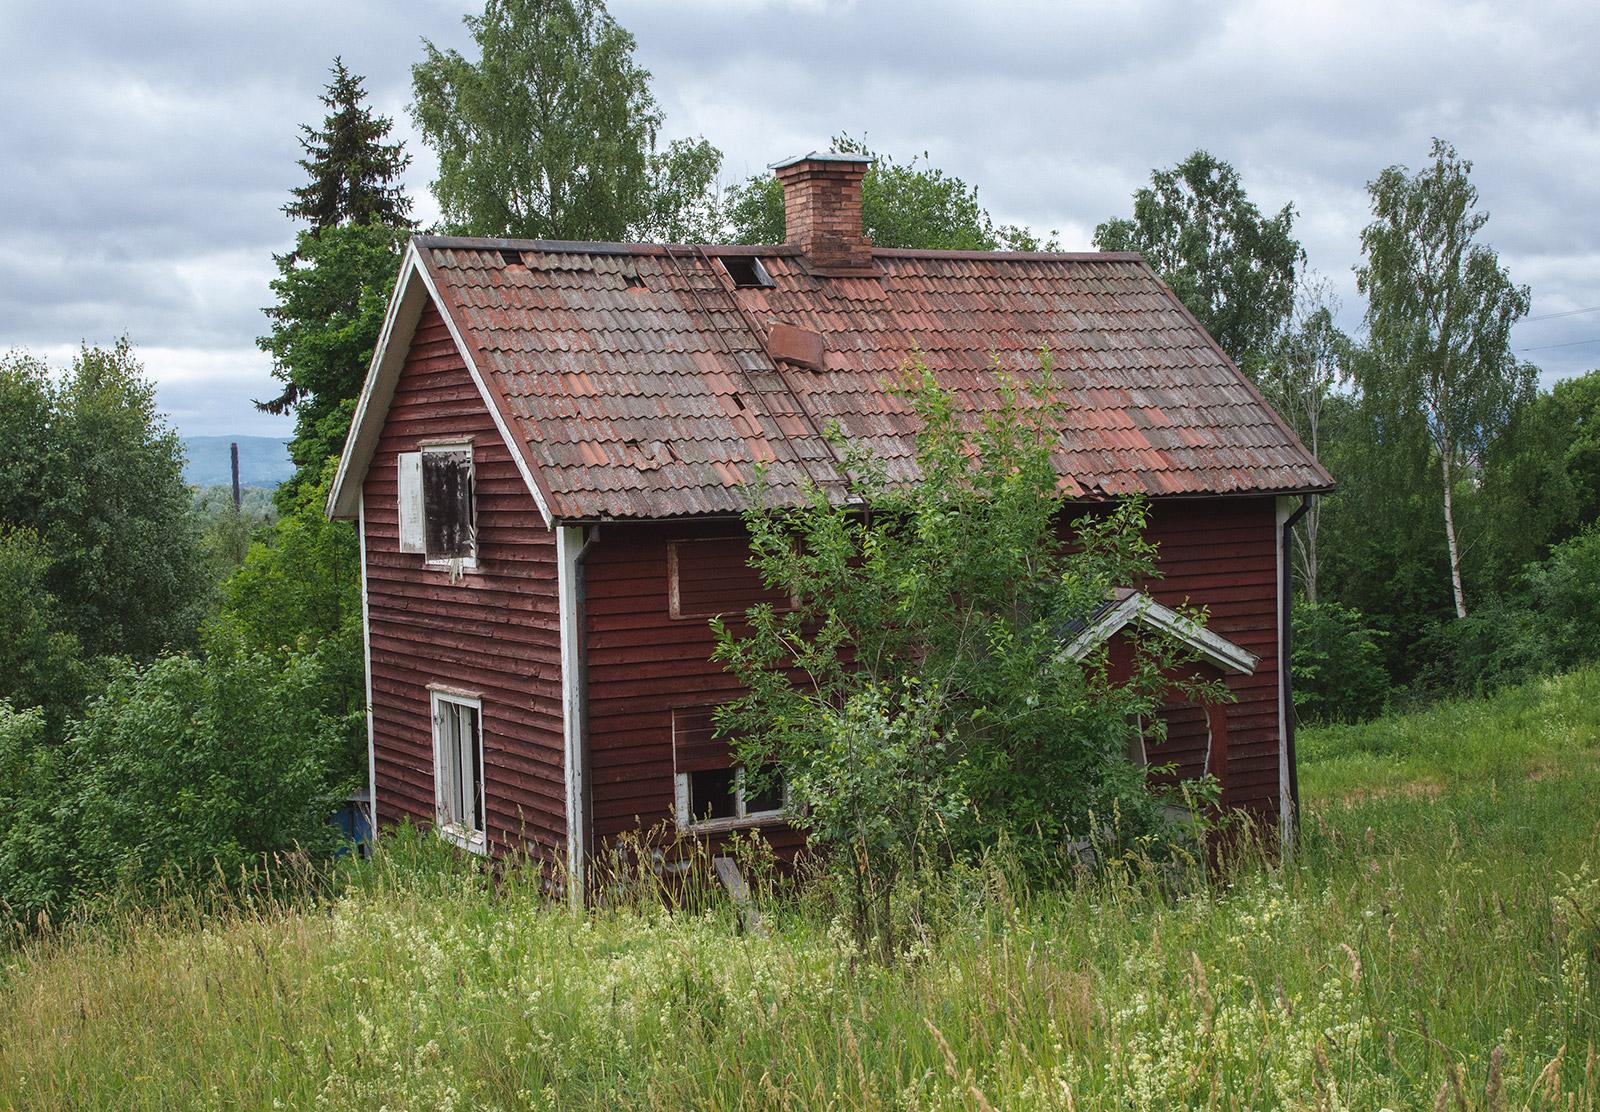 Run down wooden house